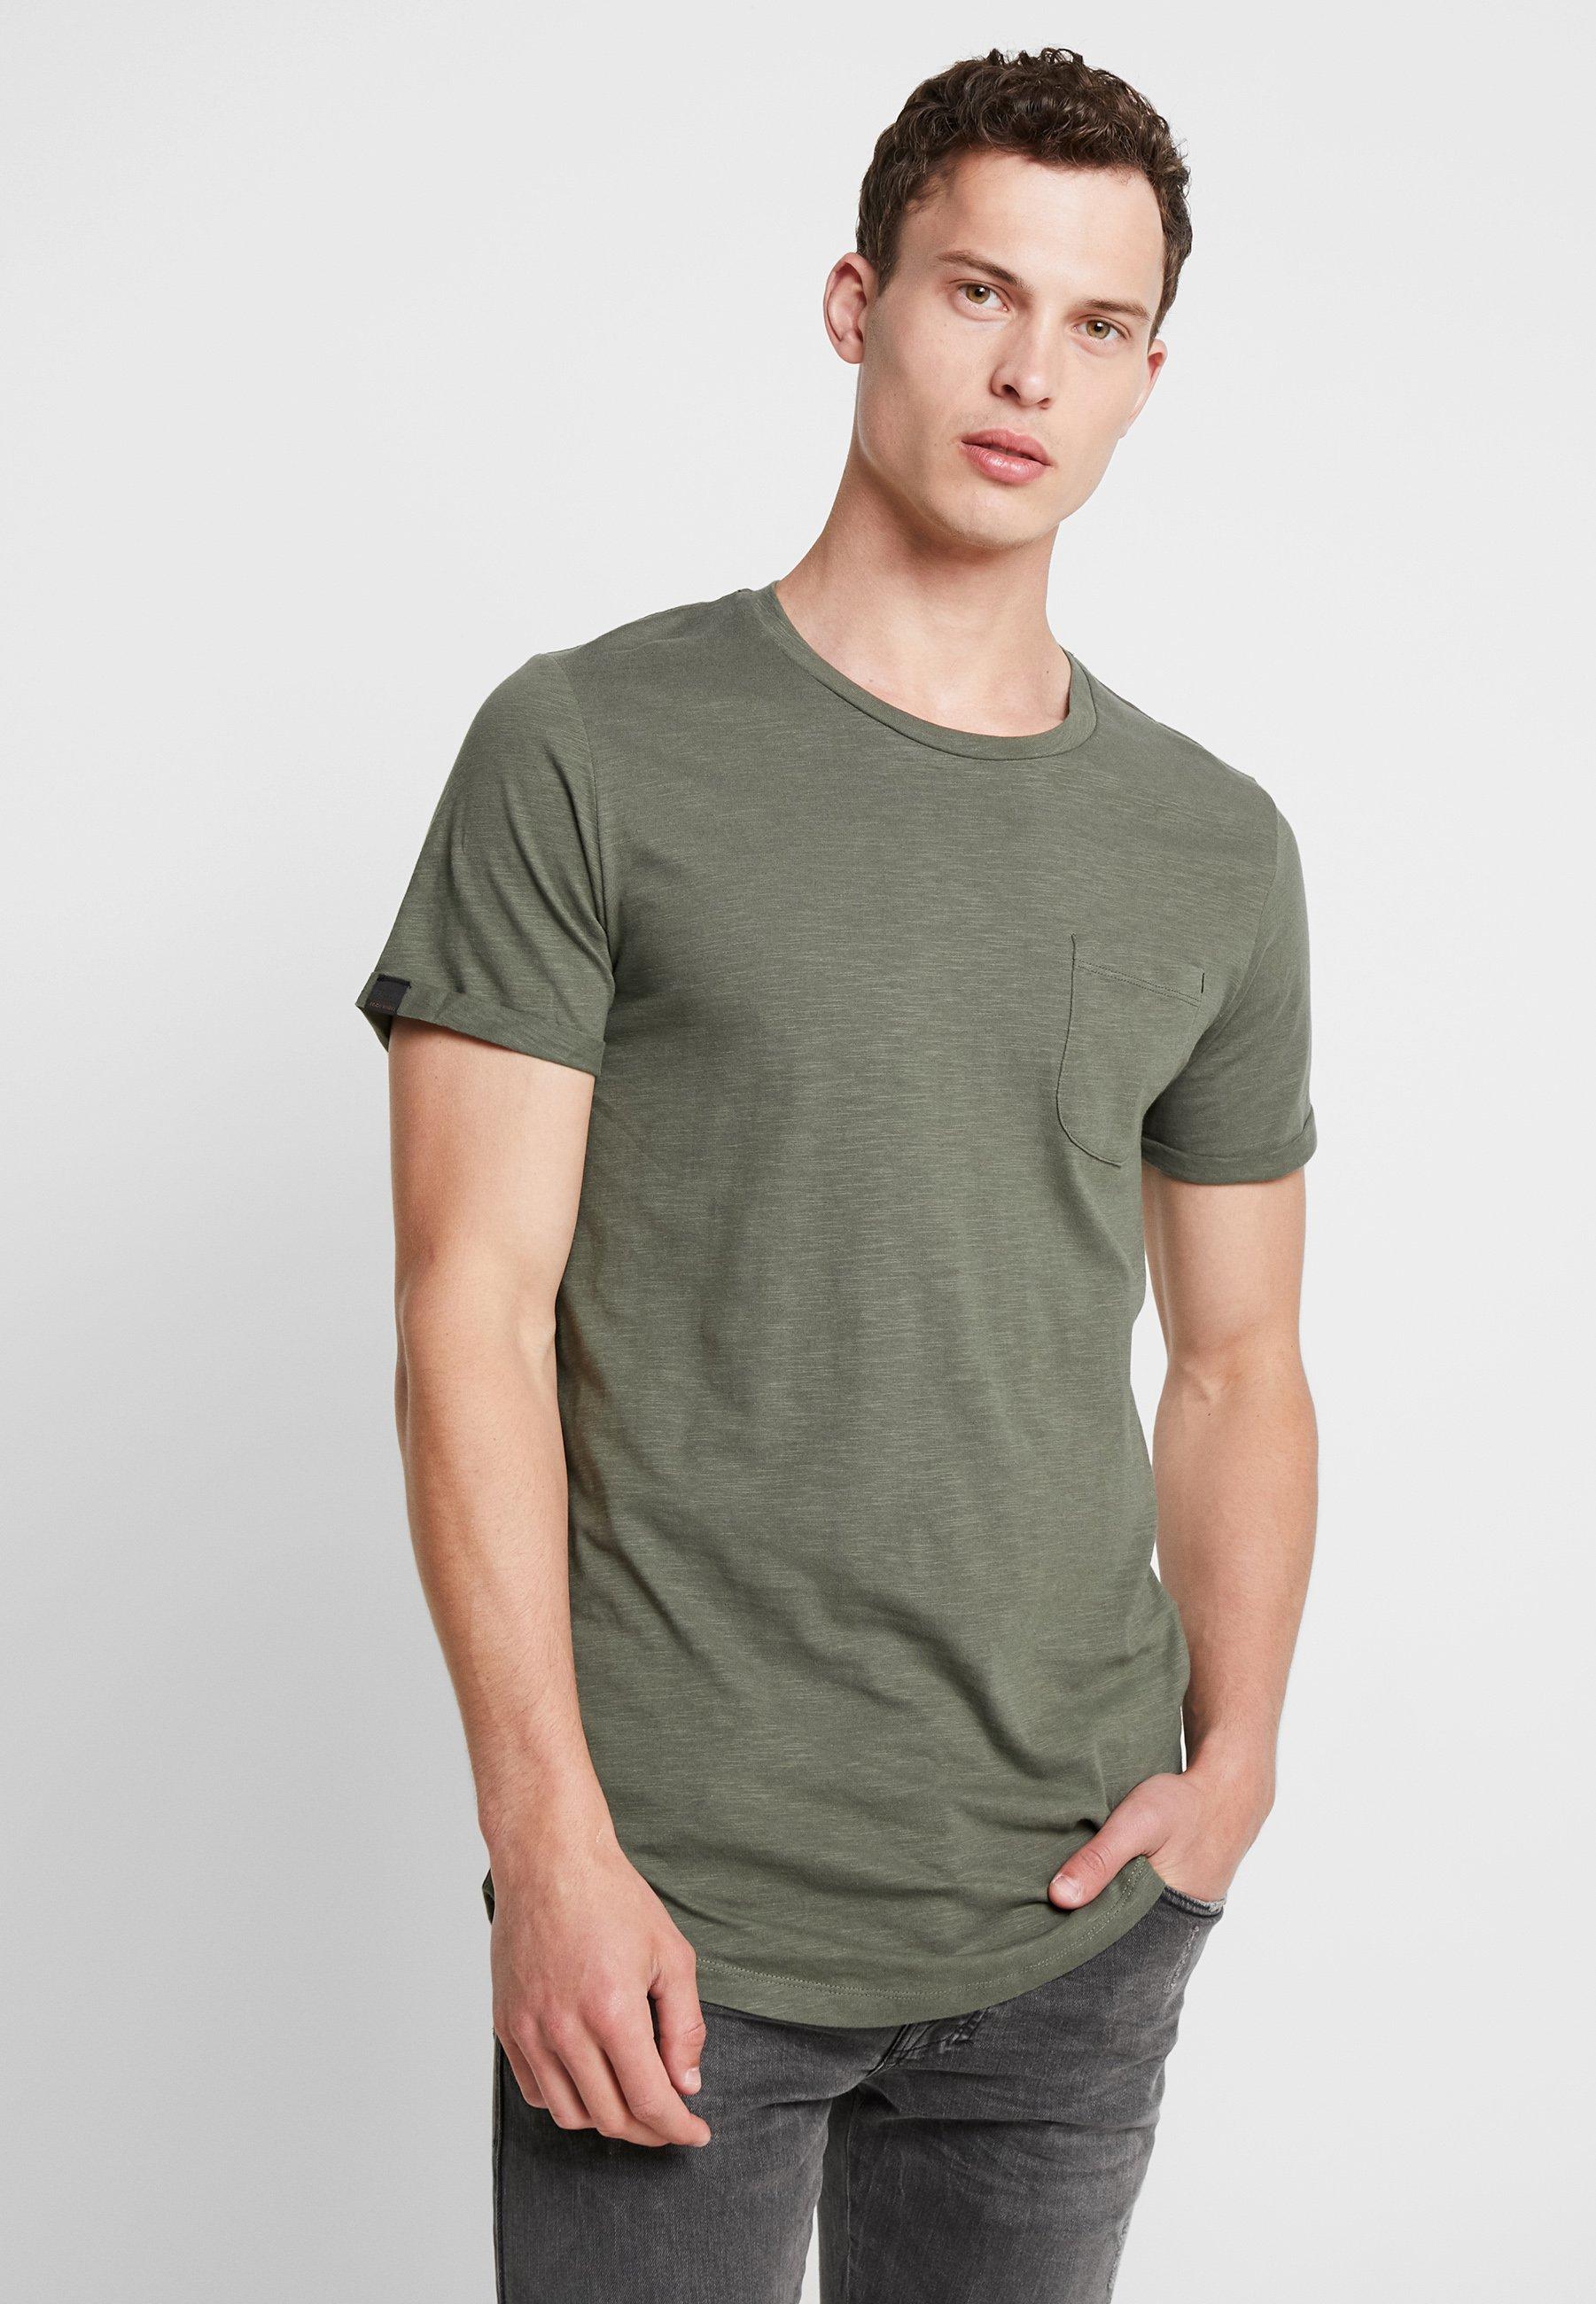 Tee Beetle LongT Pktgms Produkt shirt Basique ZOPwkuiXTl